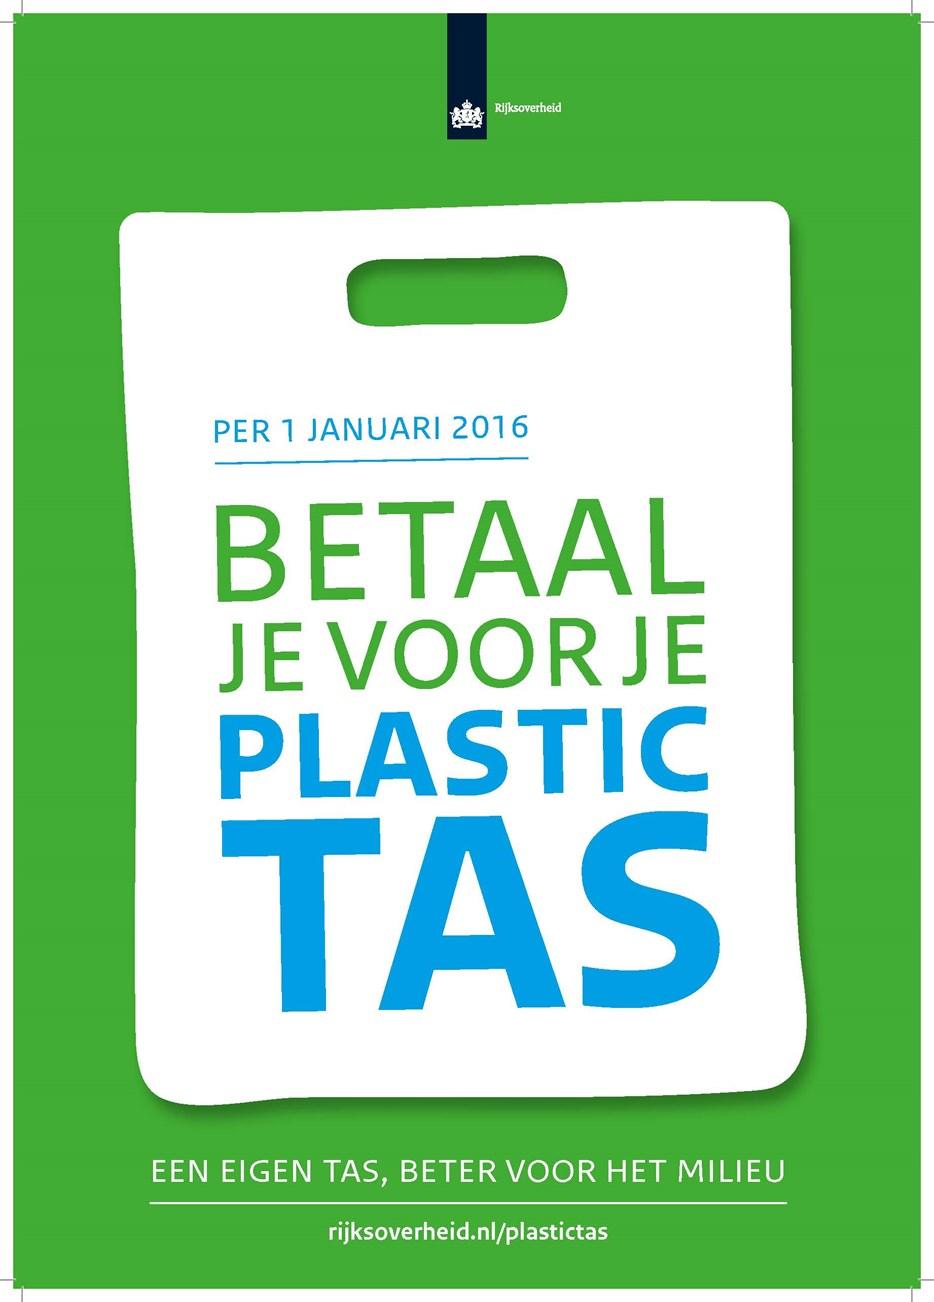 Campagne Plastic Tas_PosterA3_HR.jpg